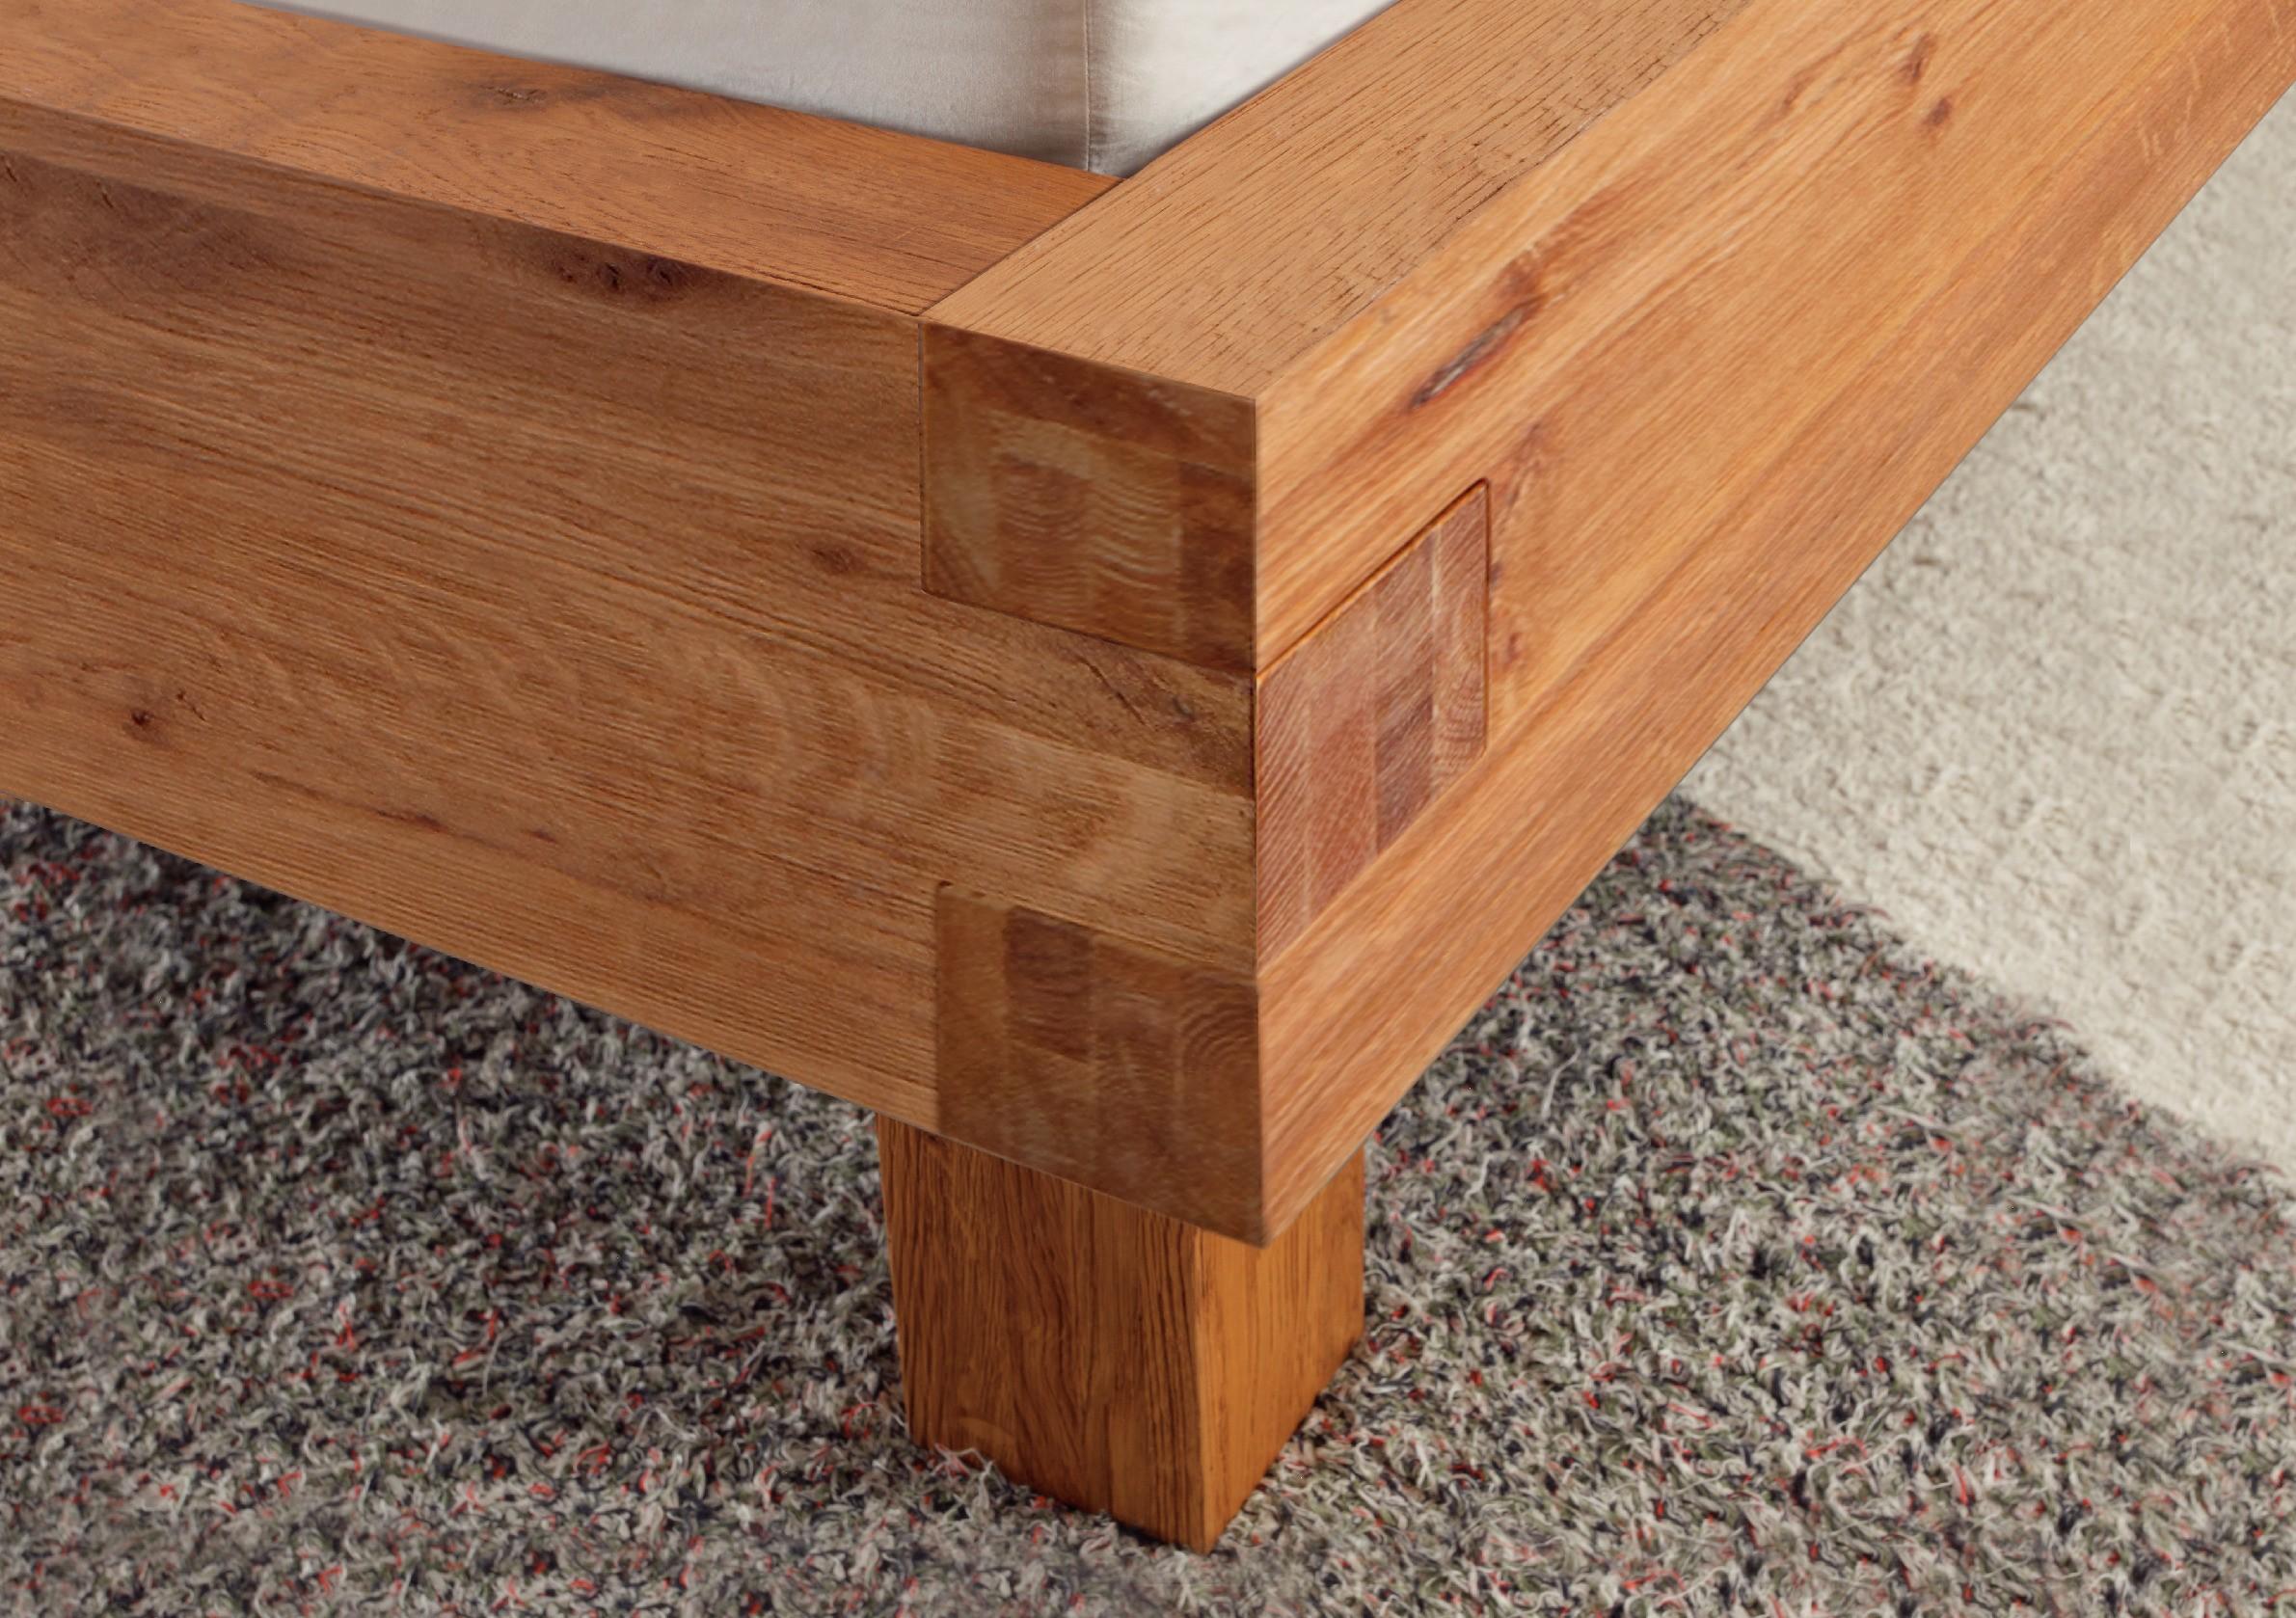 akzentmoebel unger shop bett hasena oak line wild pilatus 23. Black Bedroom Furniture Sets. Home Design Ideas